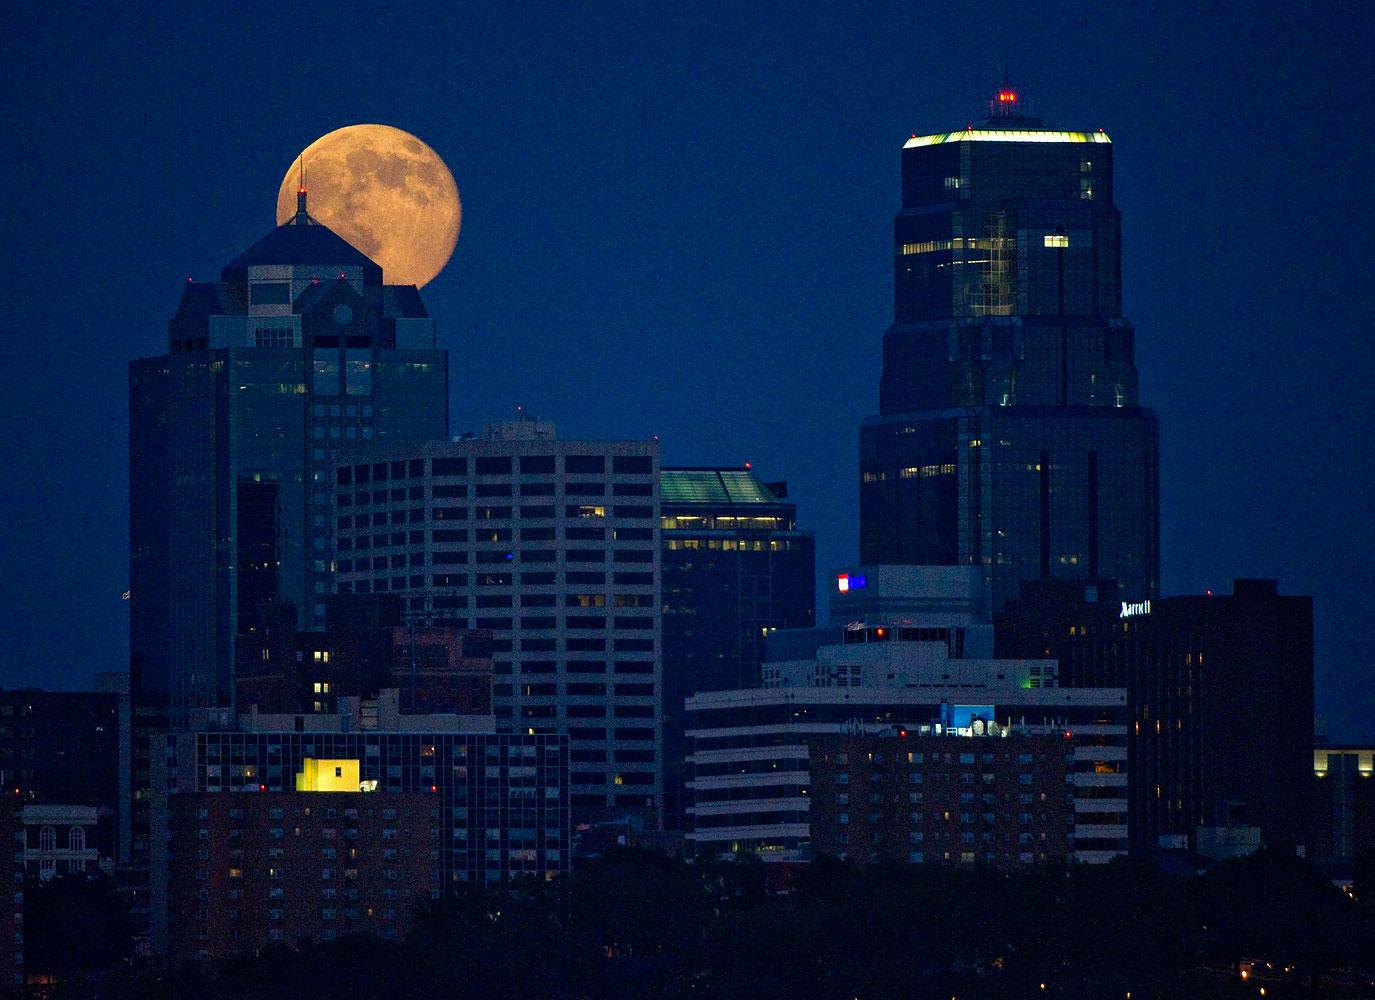 The Supermoon rises over downtown Kansas City, Missouri July 12, 2014.